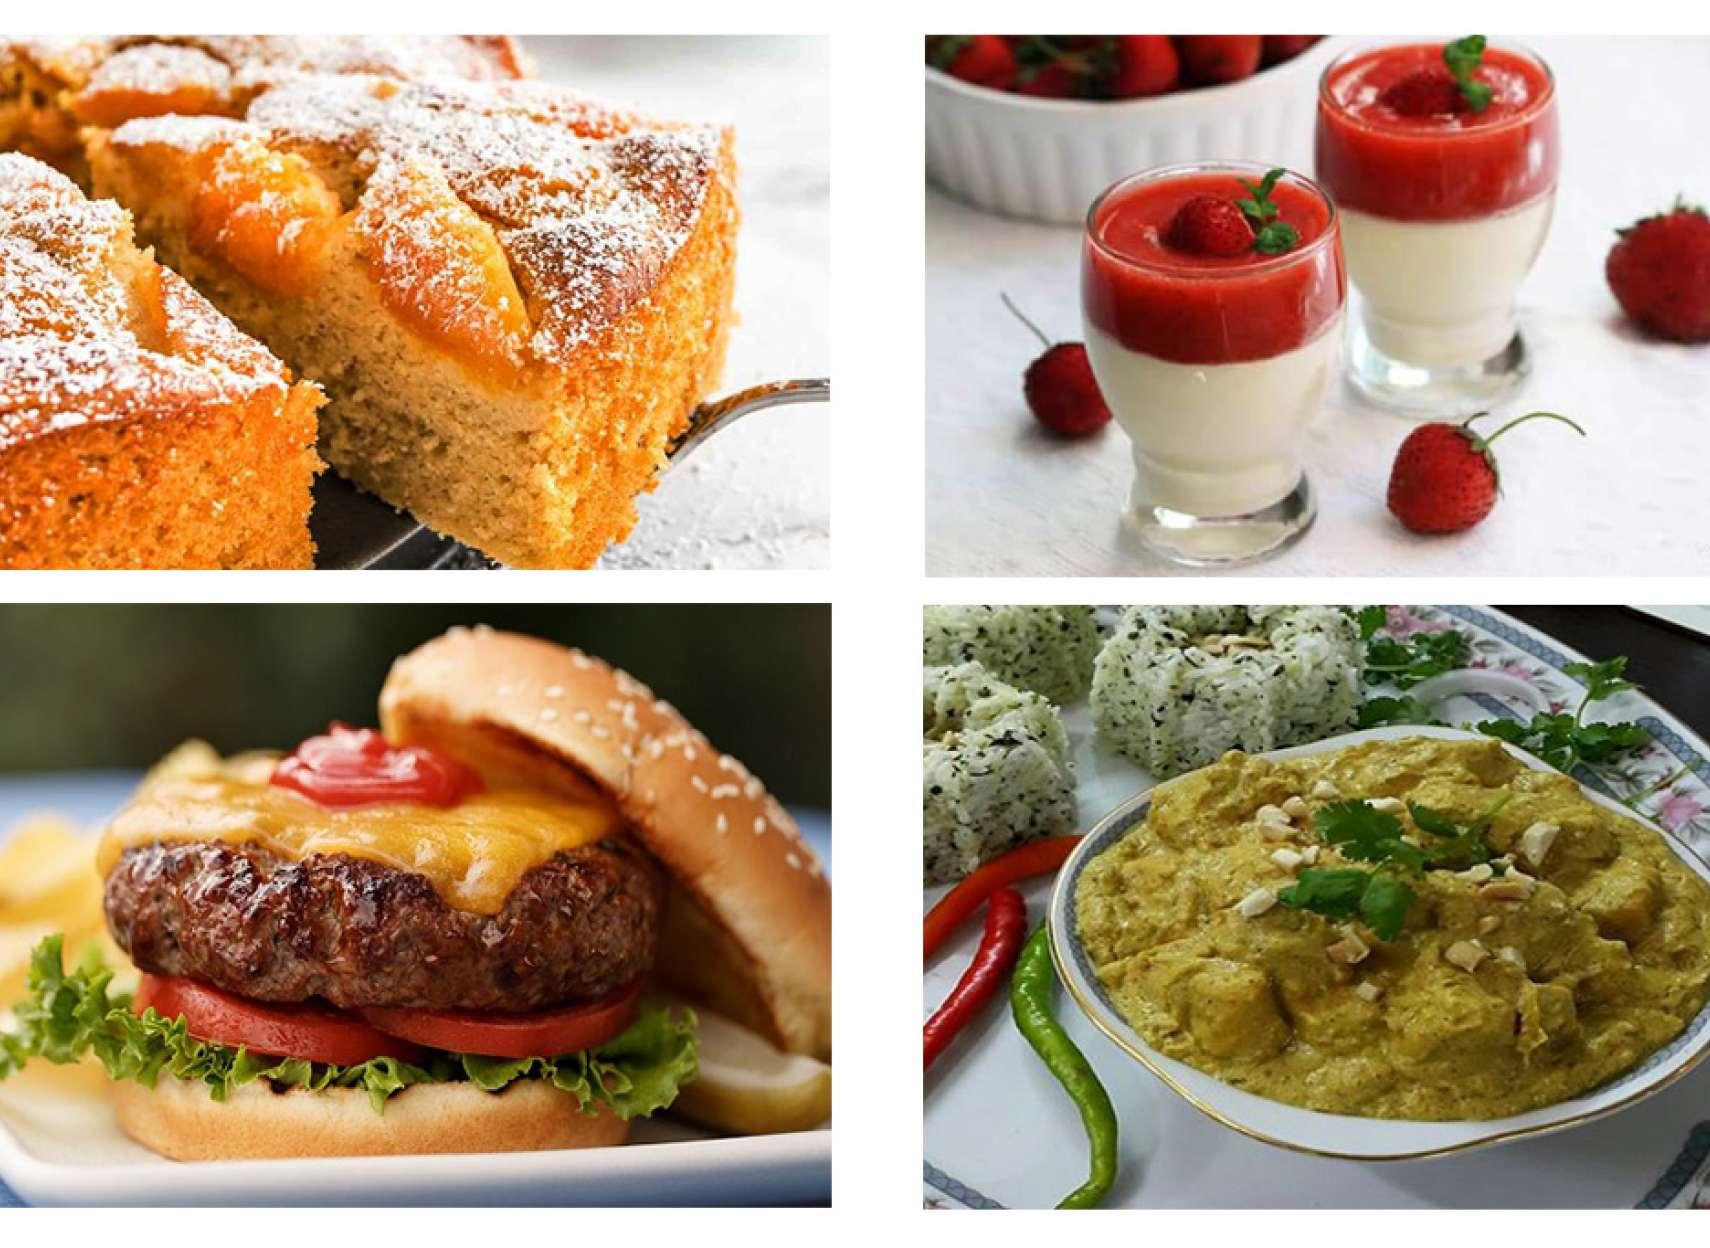 آشپزی-ترابی-کراکت-بادمجان-دسر-شاتوتی-مرغ-حیدرآبادی-کیک-برگردان-زردآلو-پاناکوتا